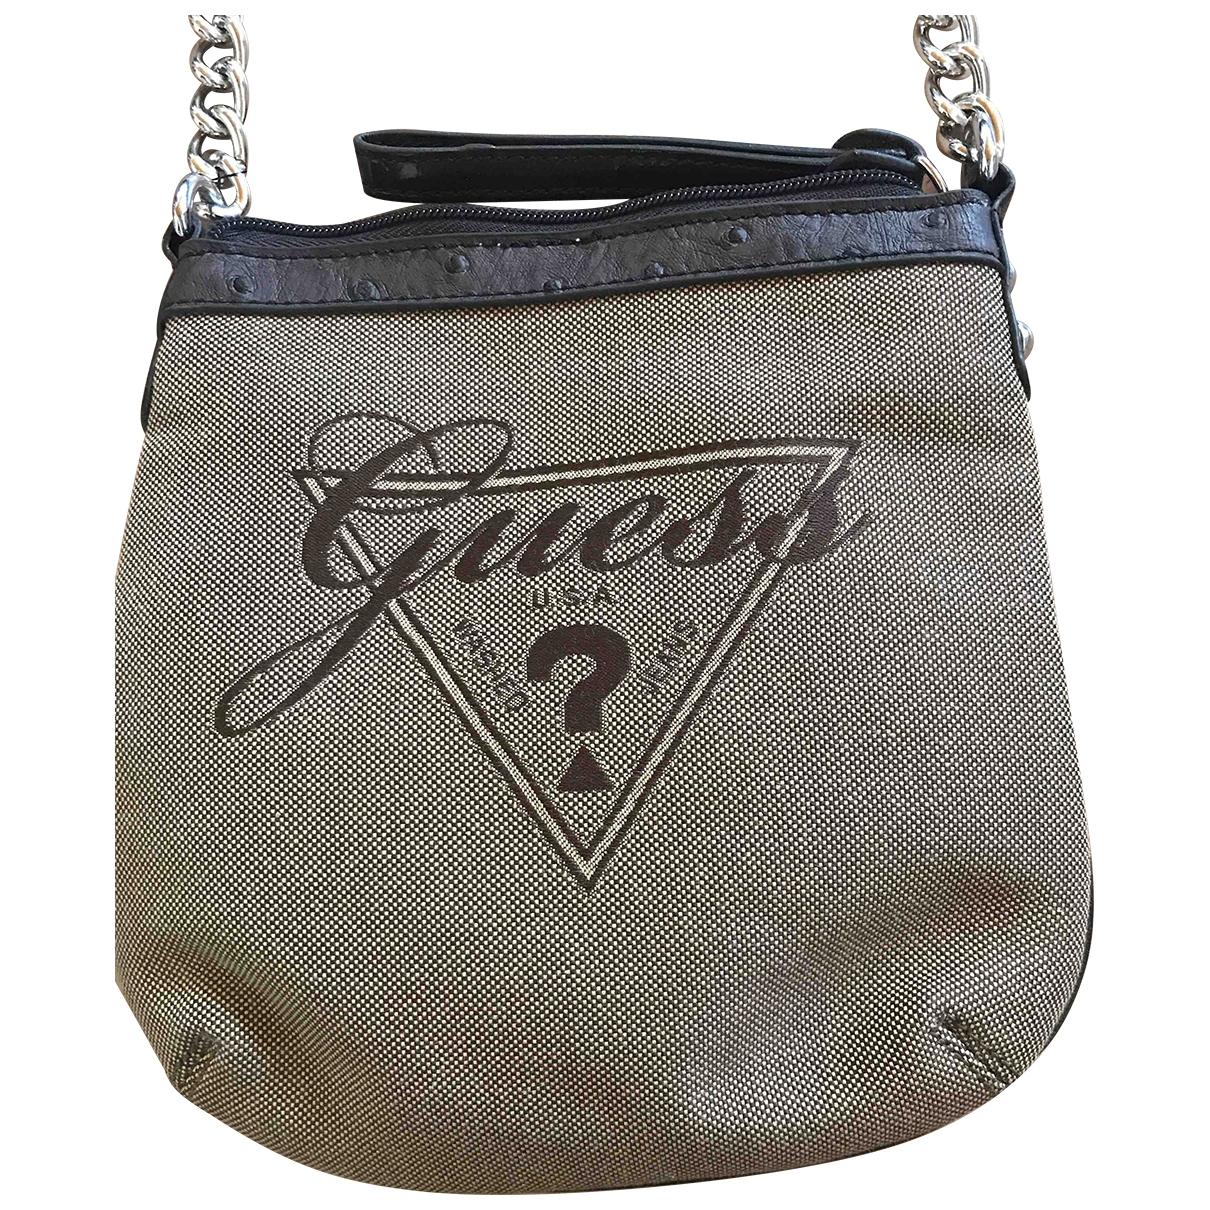 Guess \N Beige Cotton handbag for Women \N